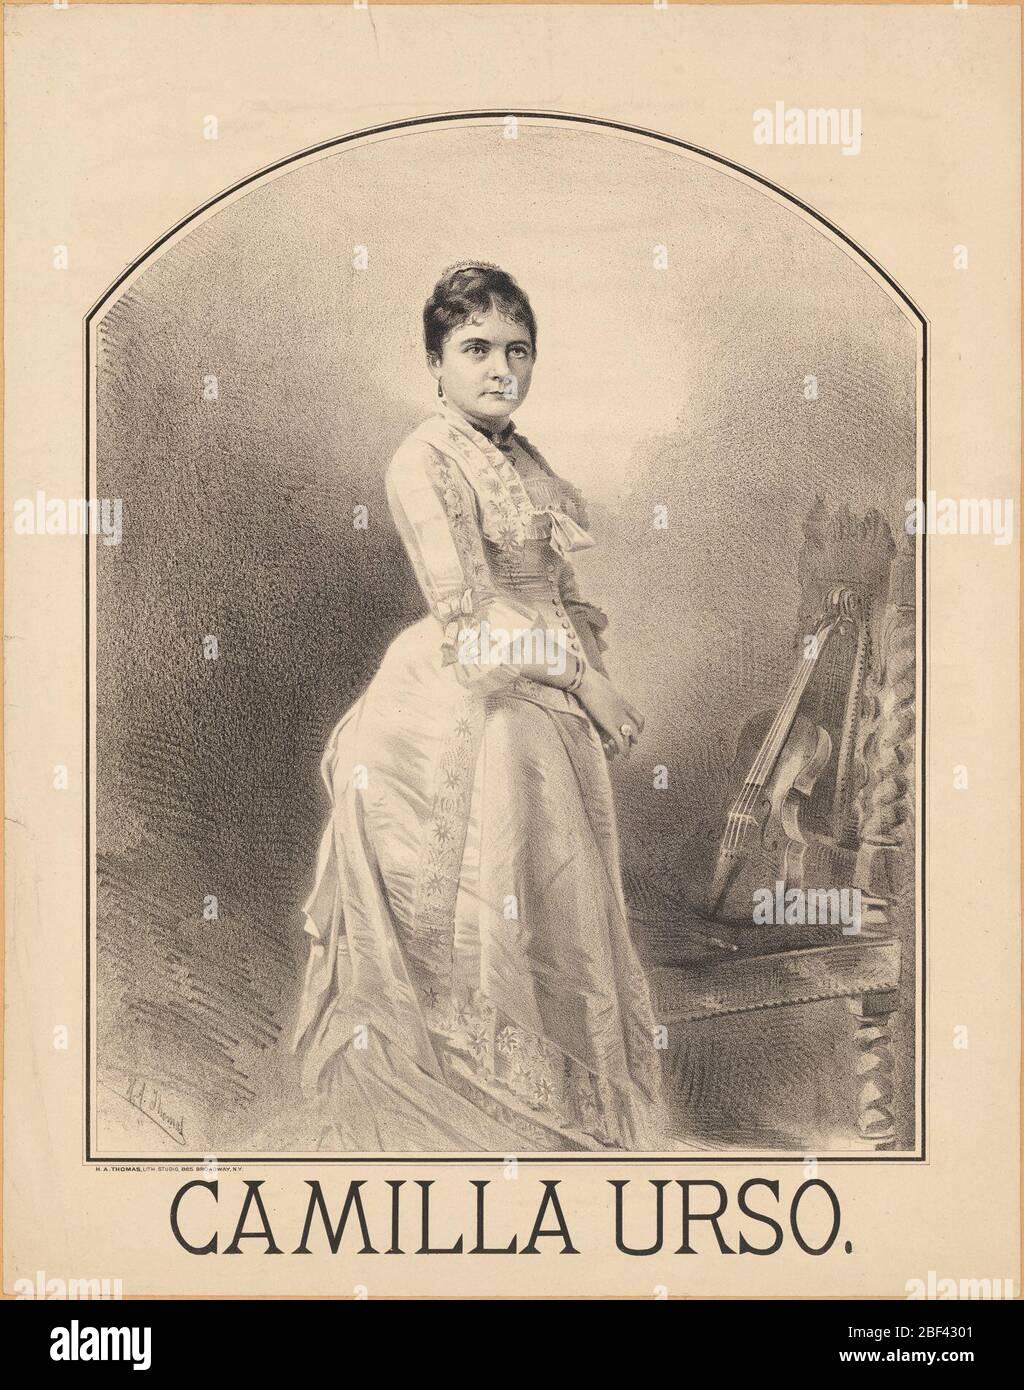 Camille Urso. Stock Photo